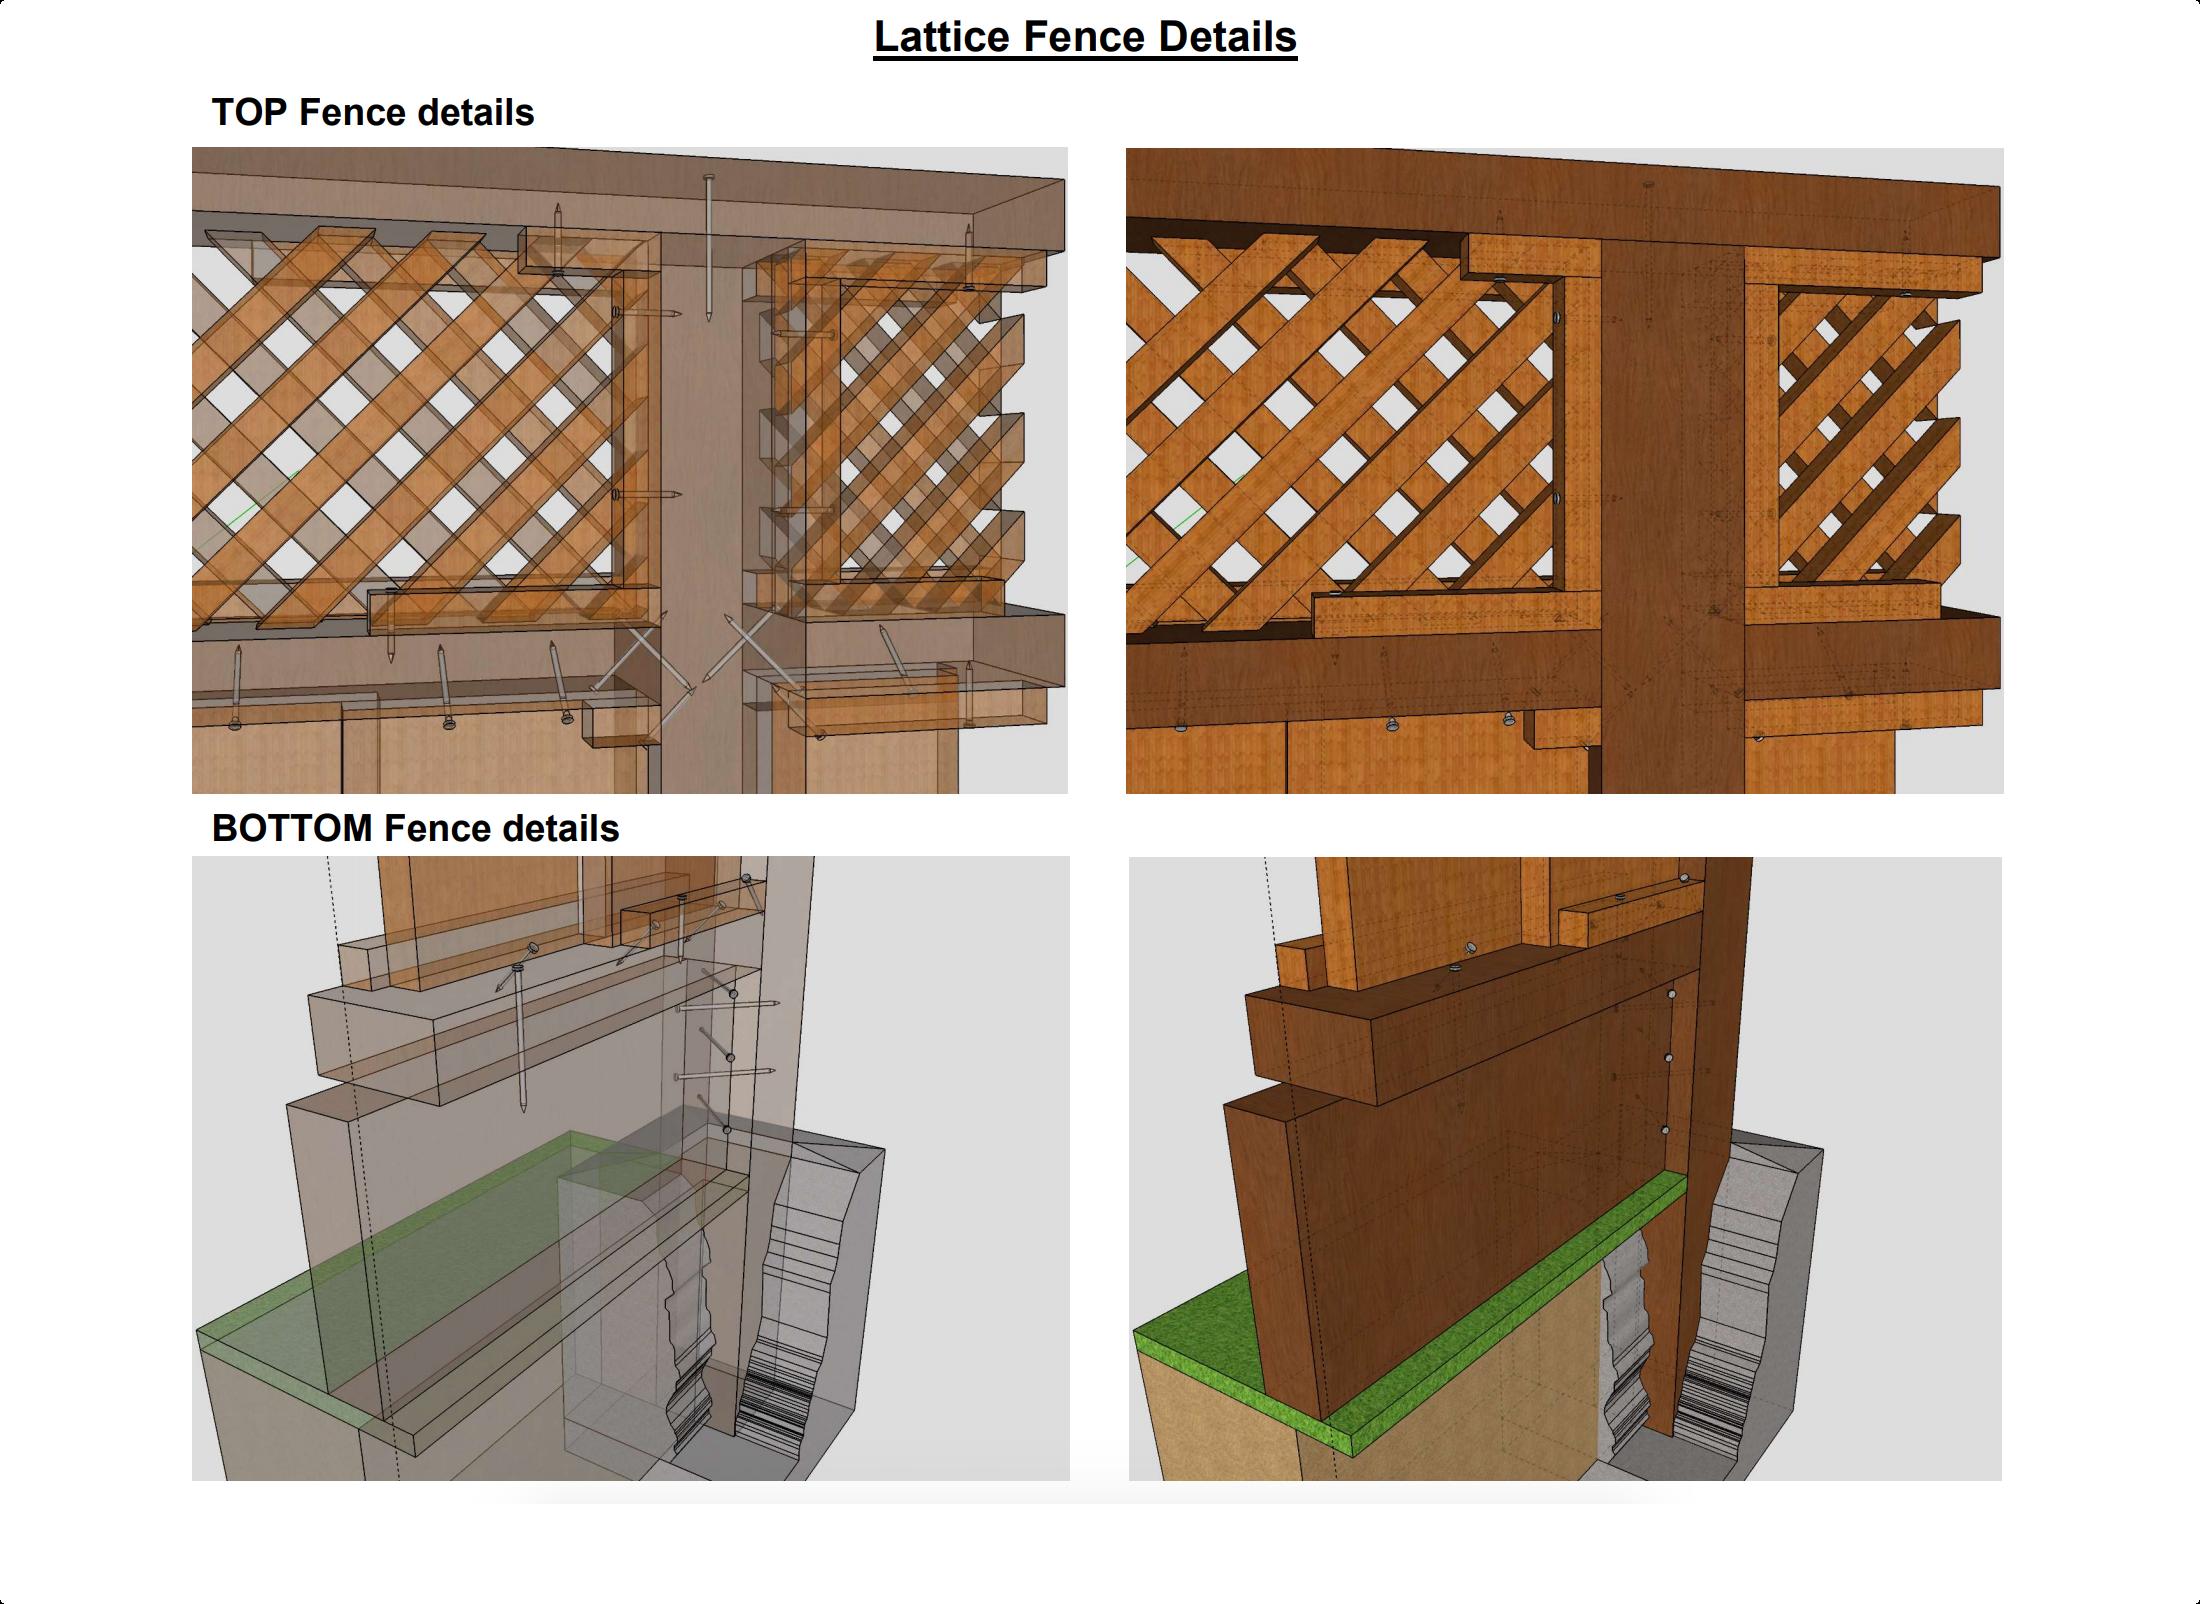 Lattice fence details